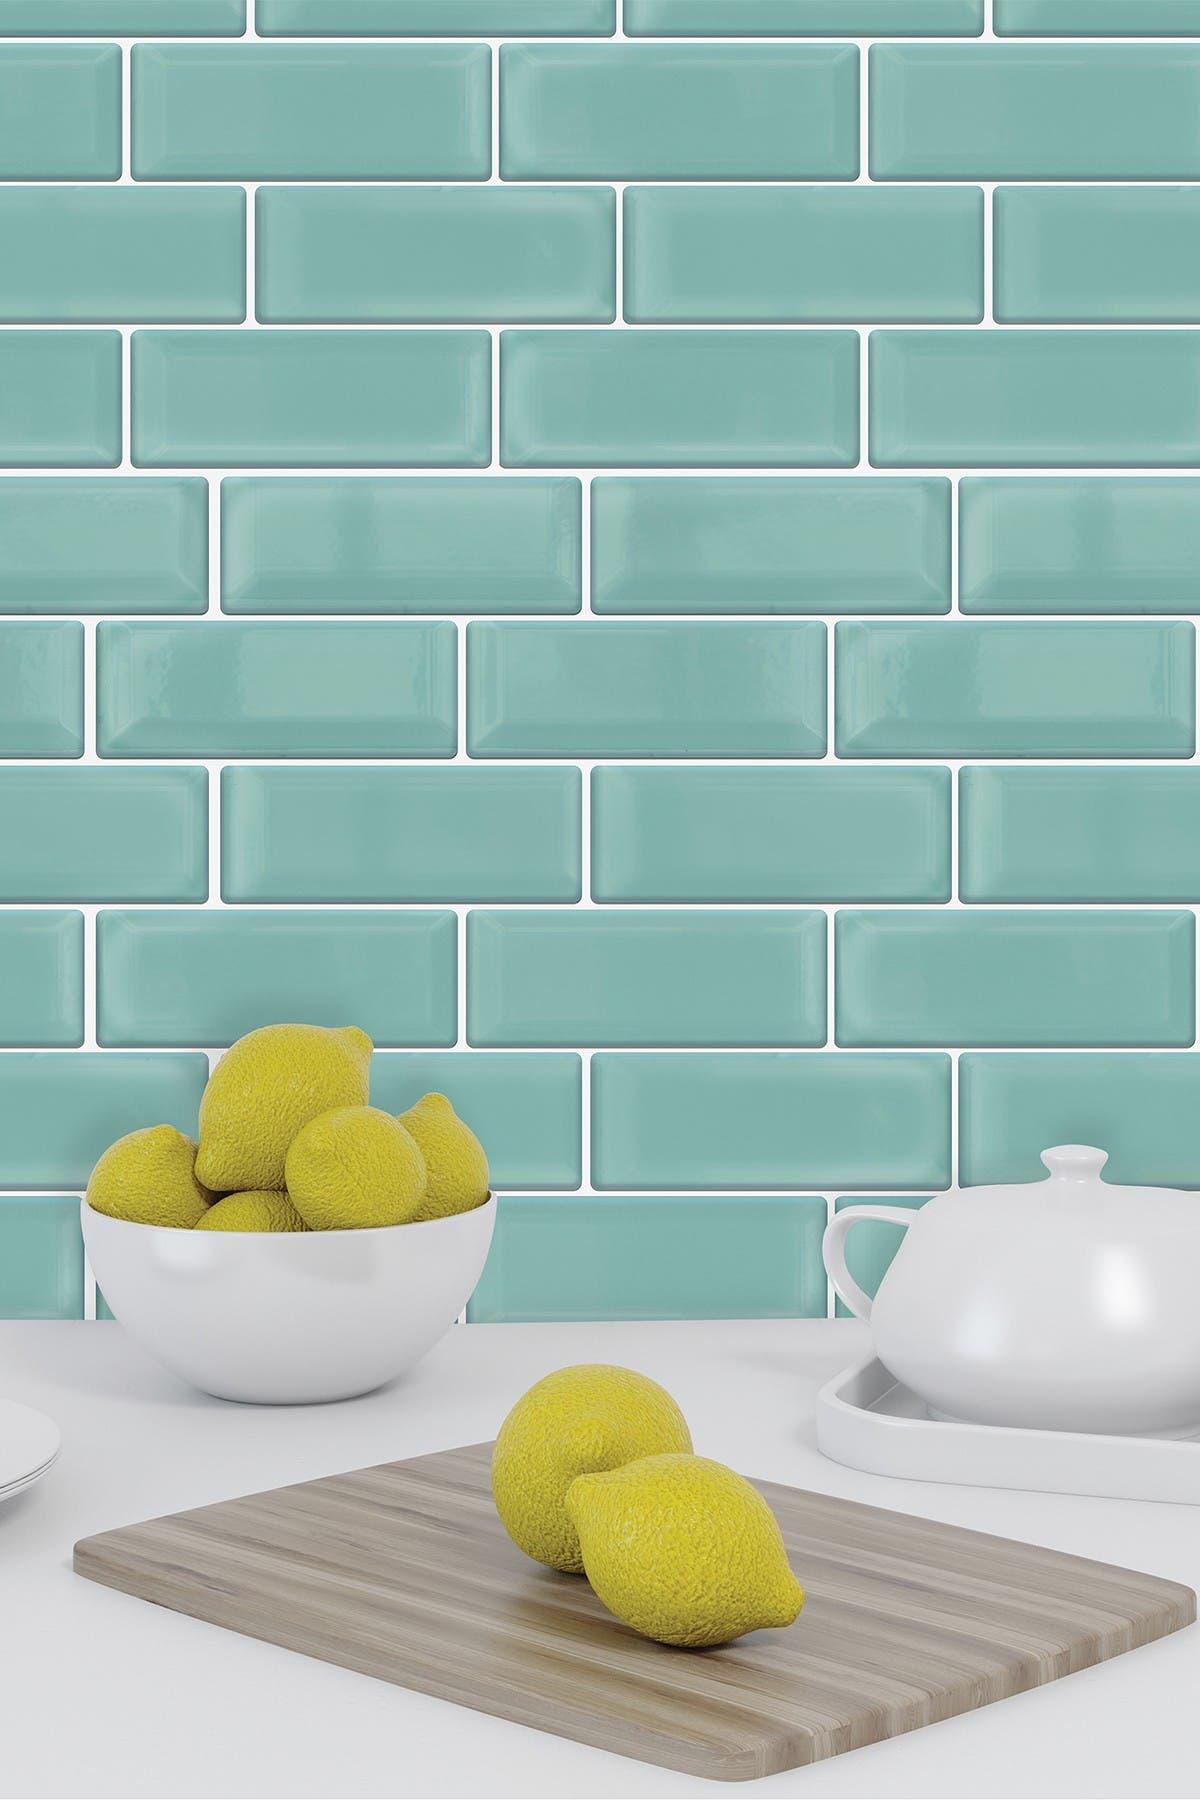 Image of WalPlus Green Sea Glossy 3D Metro Sticker Tiles Contemporary Eclectic Wall Splashbacks Mosaics